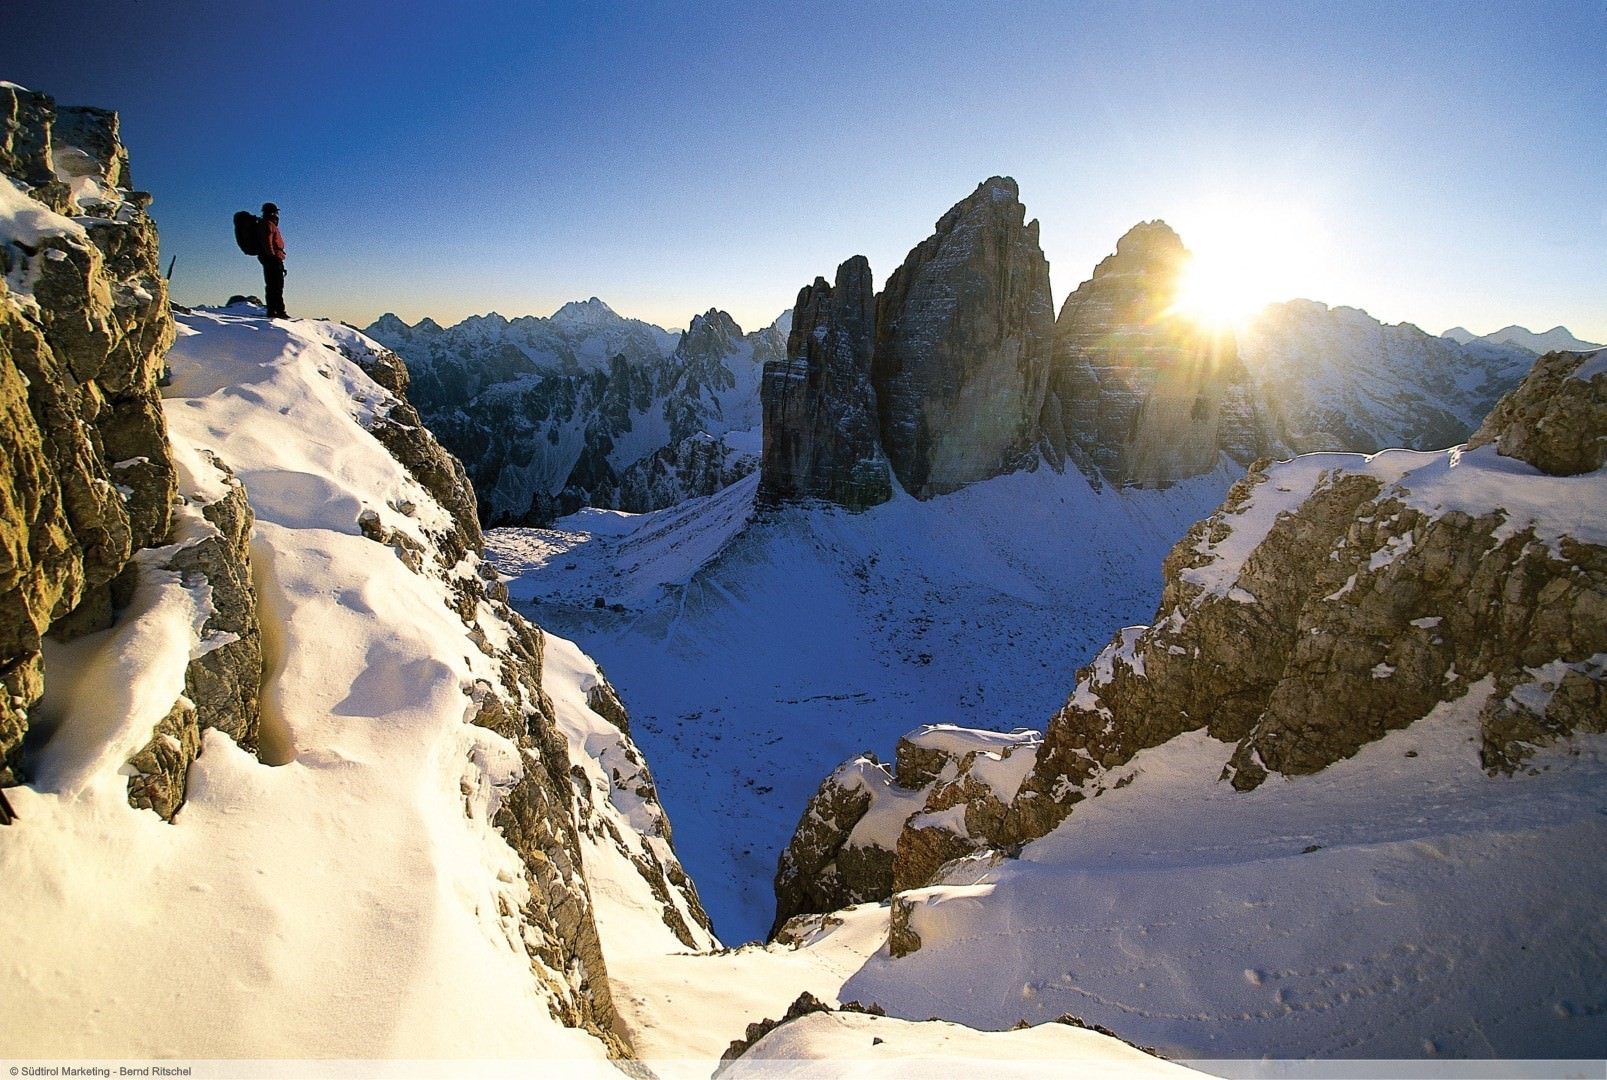 Winterurlaub Weihnachten 2019.Skiurlaub Italien 2019 Skireisen Italien 2020 Südtirol Unterkünfte